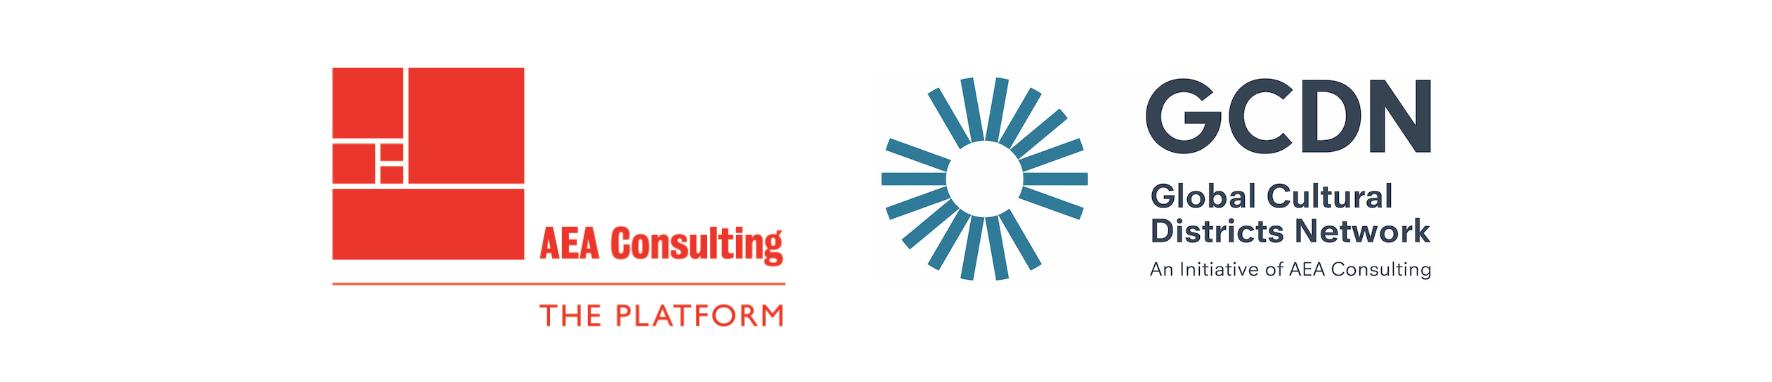 AEA Consulting: The Platform